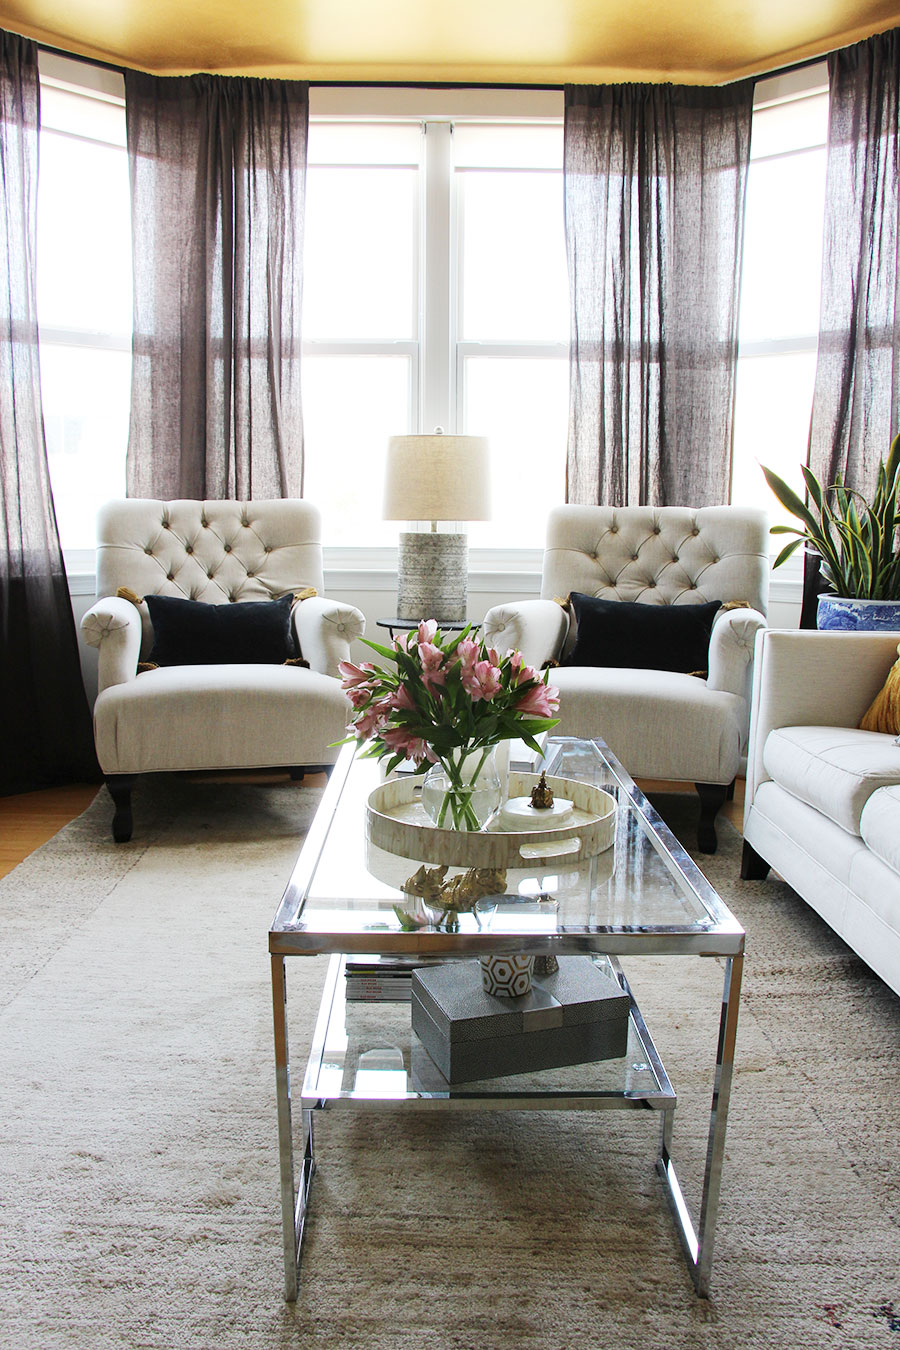 Chic Glam Decor Lifestyle Living Room Interior Design